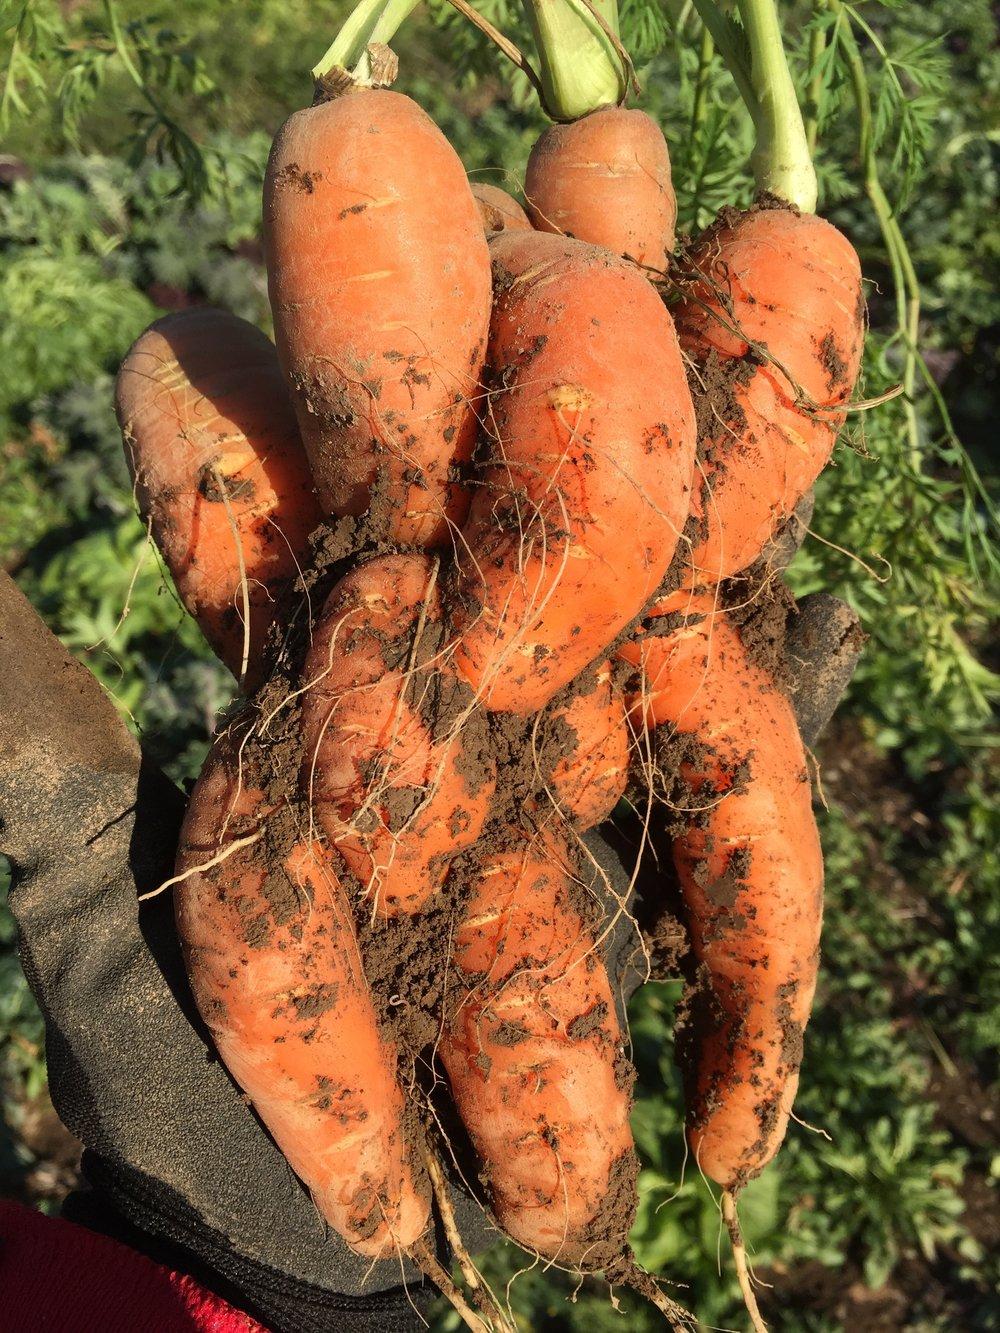 Tangled Carrots